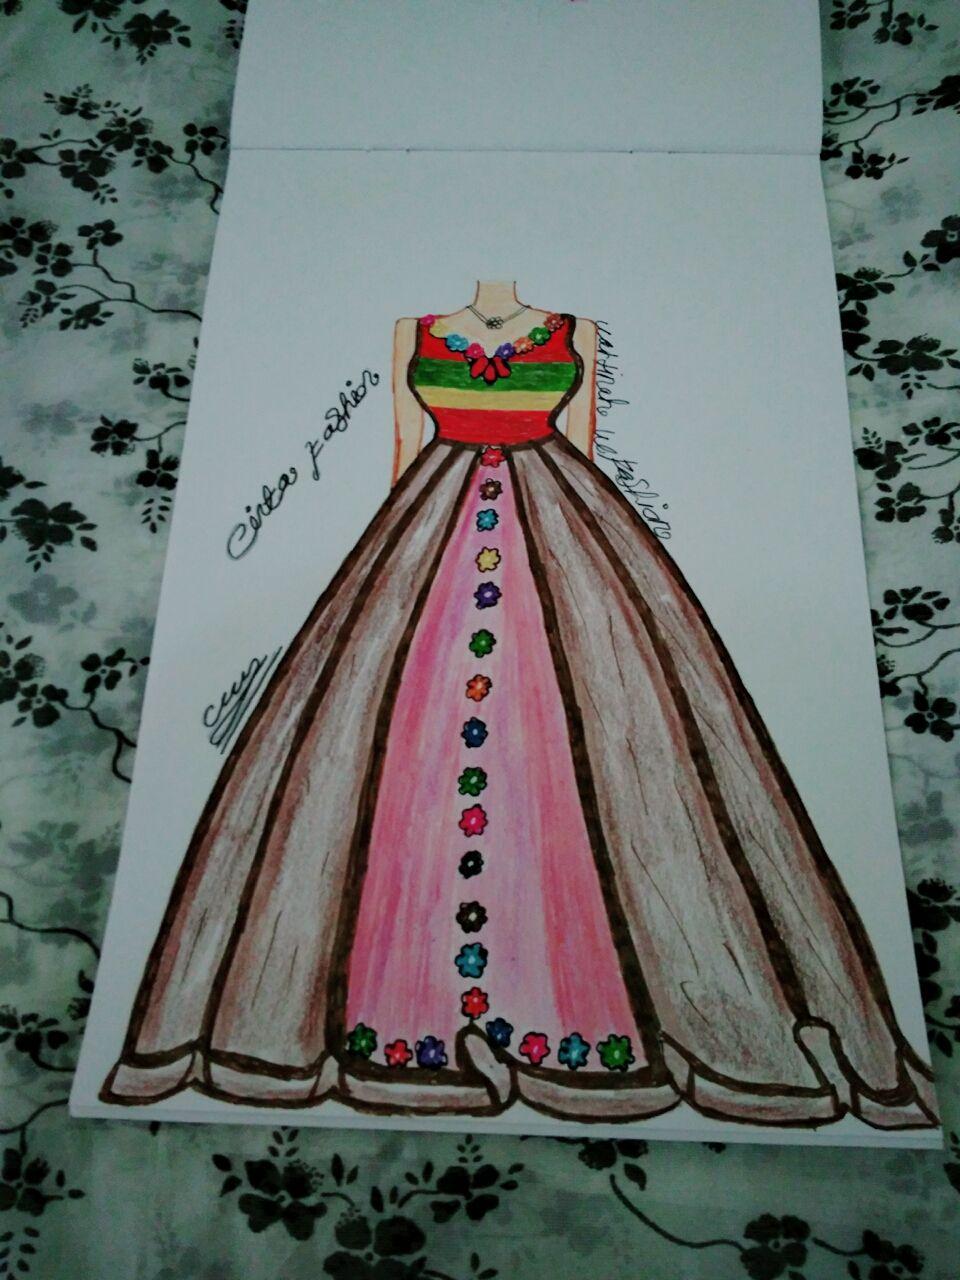 Kumpulan Soal Pelajaran 8 Sketsa Desain Baju Gaun Pesta